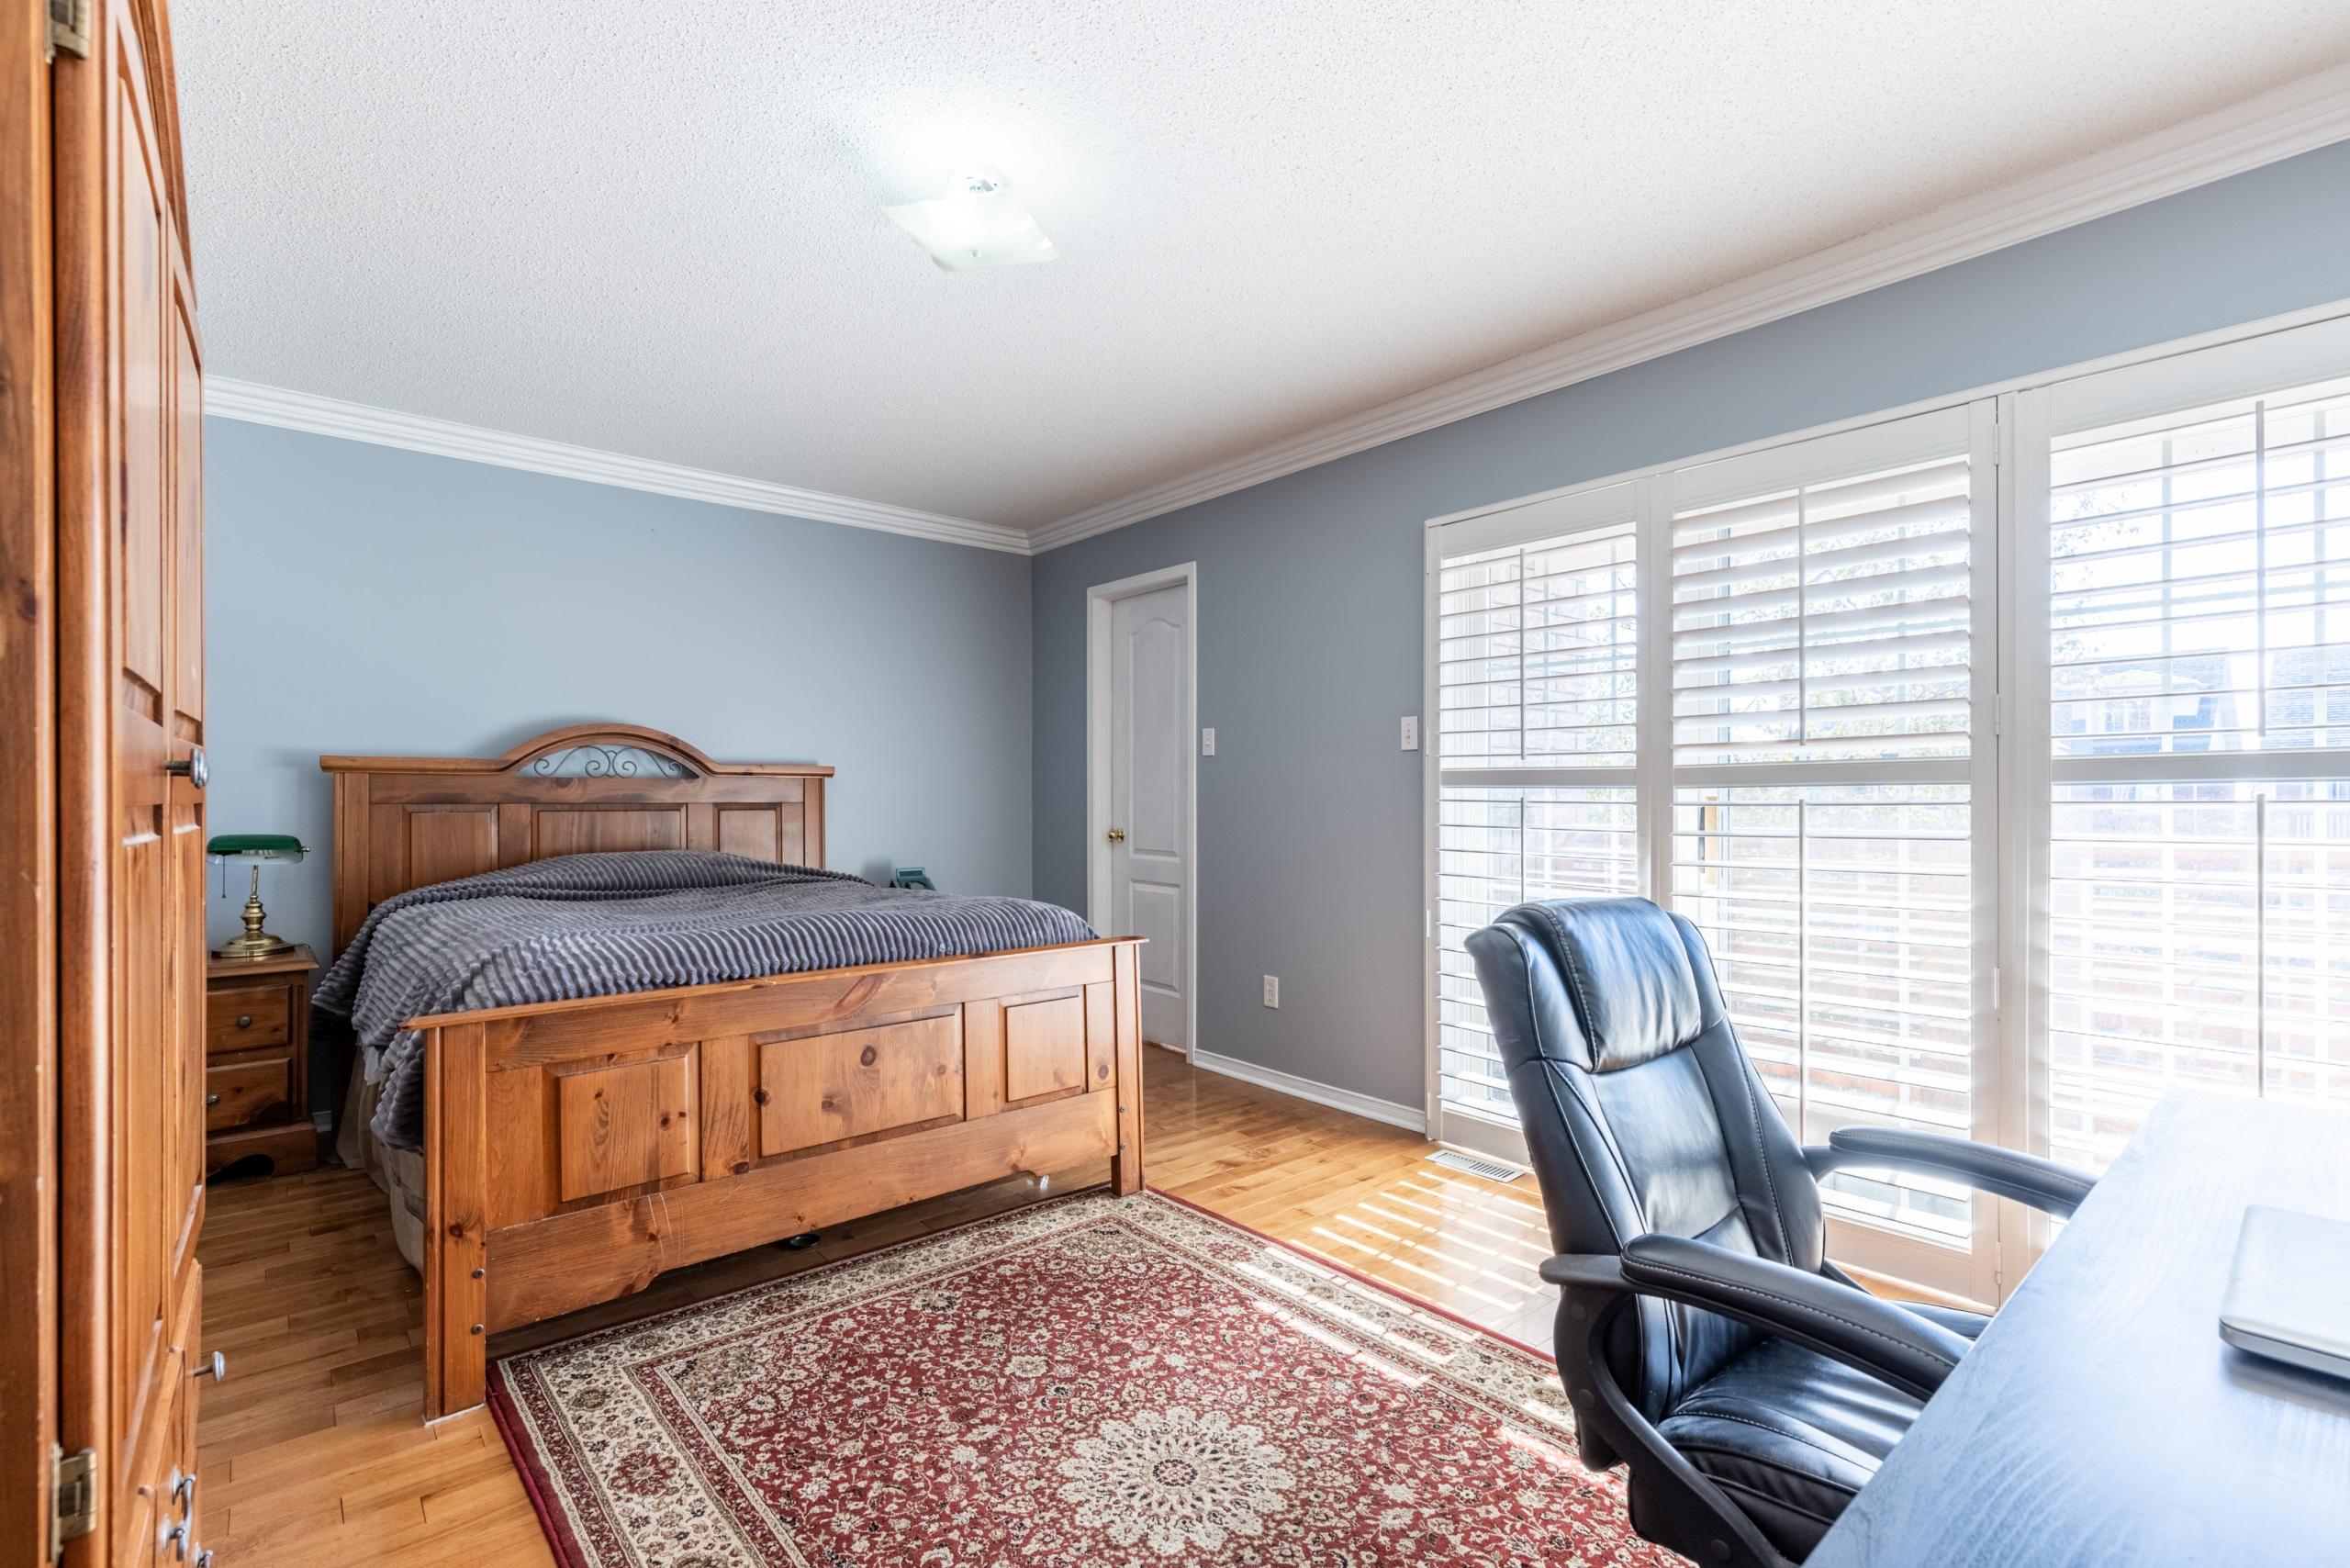 Bedroom featured at 343 Wildgrass Road, Mississauga, ON at Alex Irish & Associates